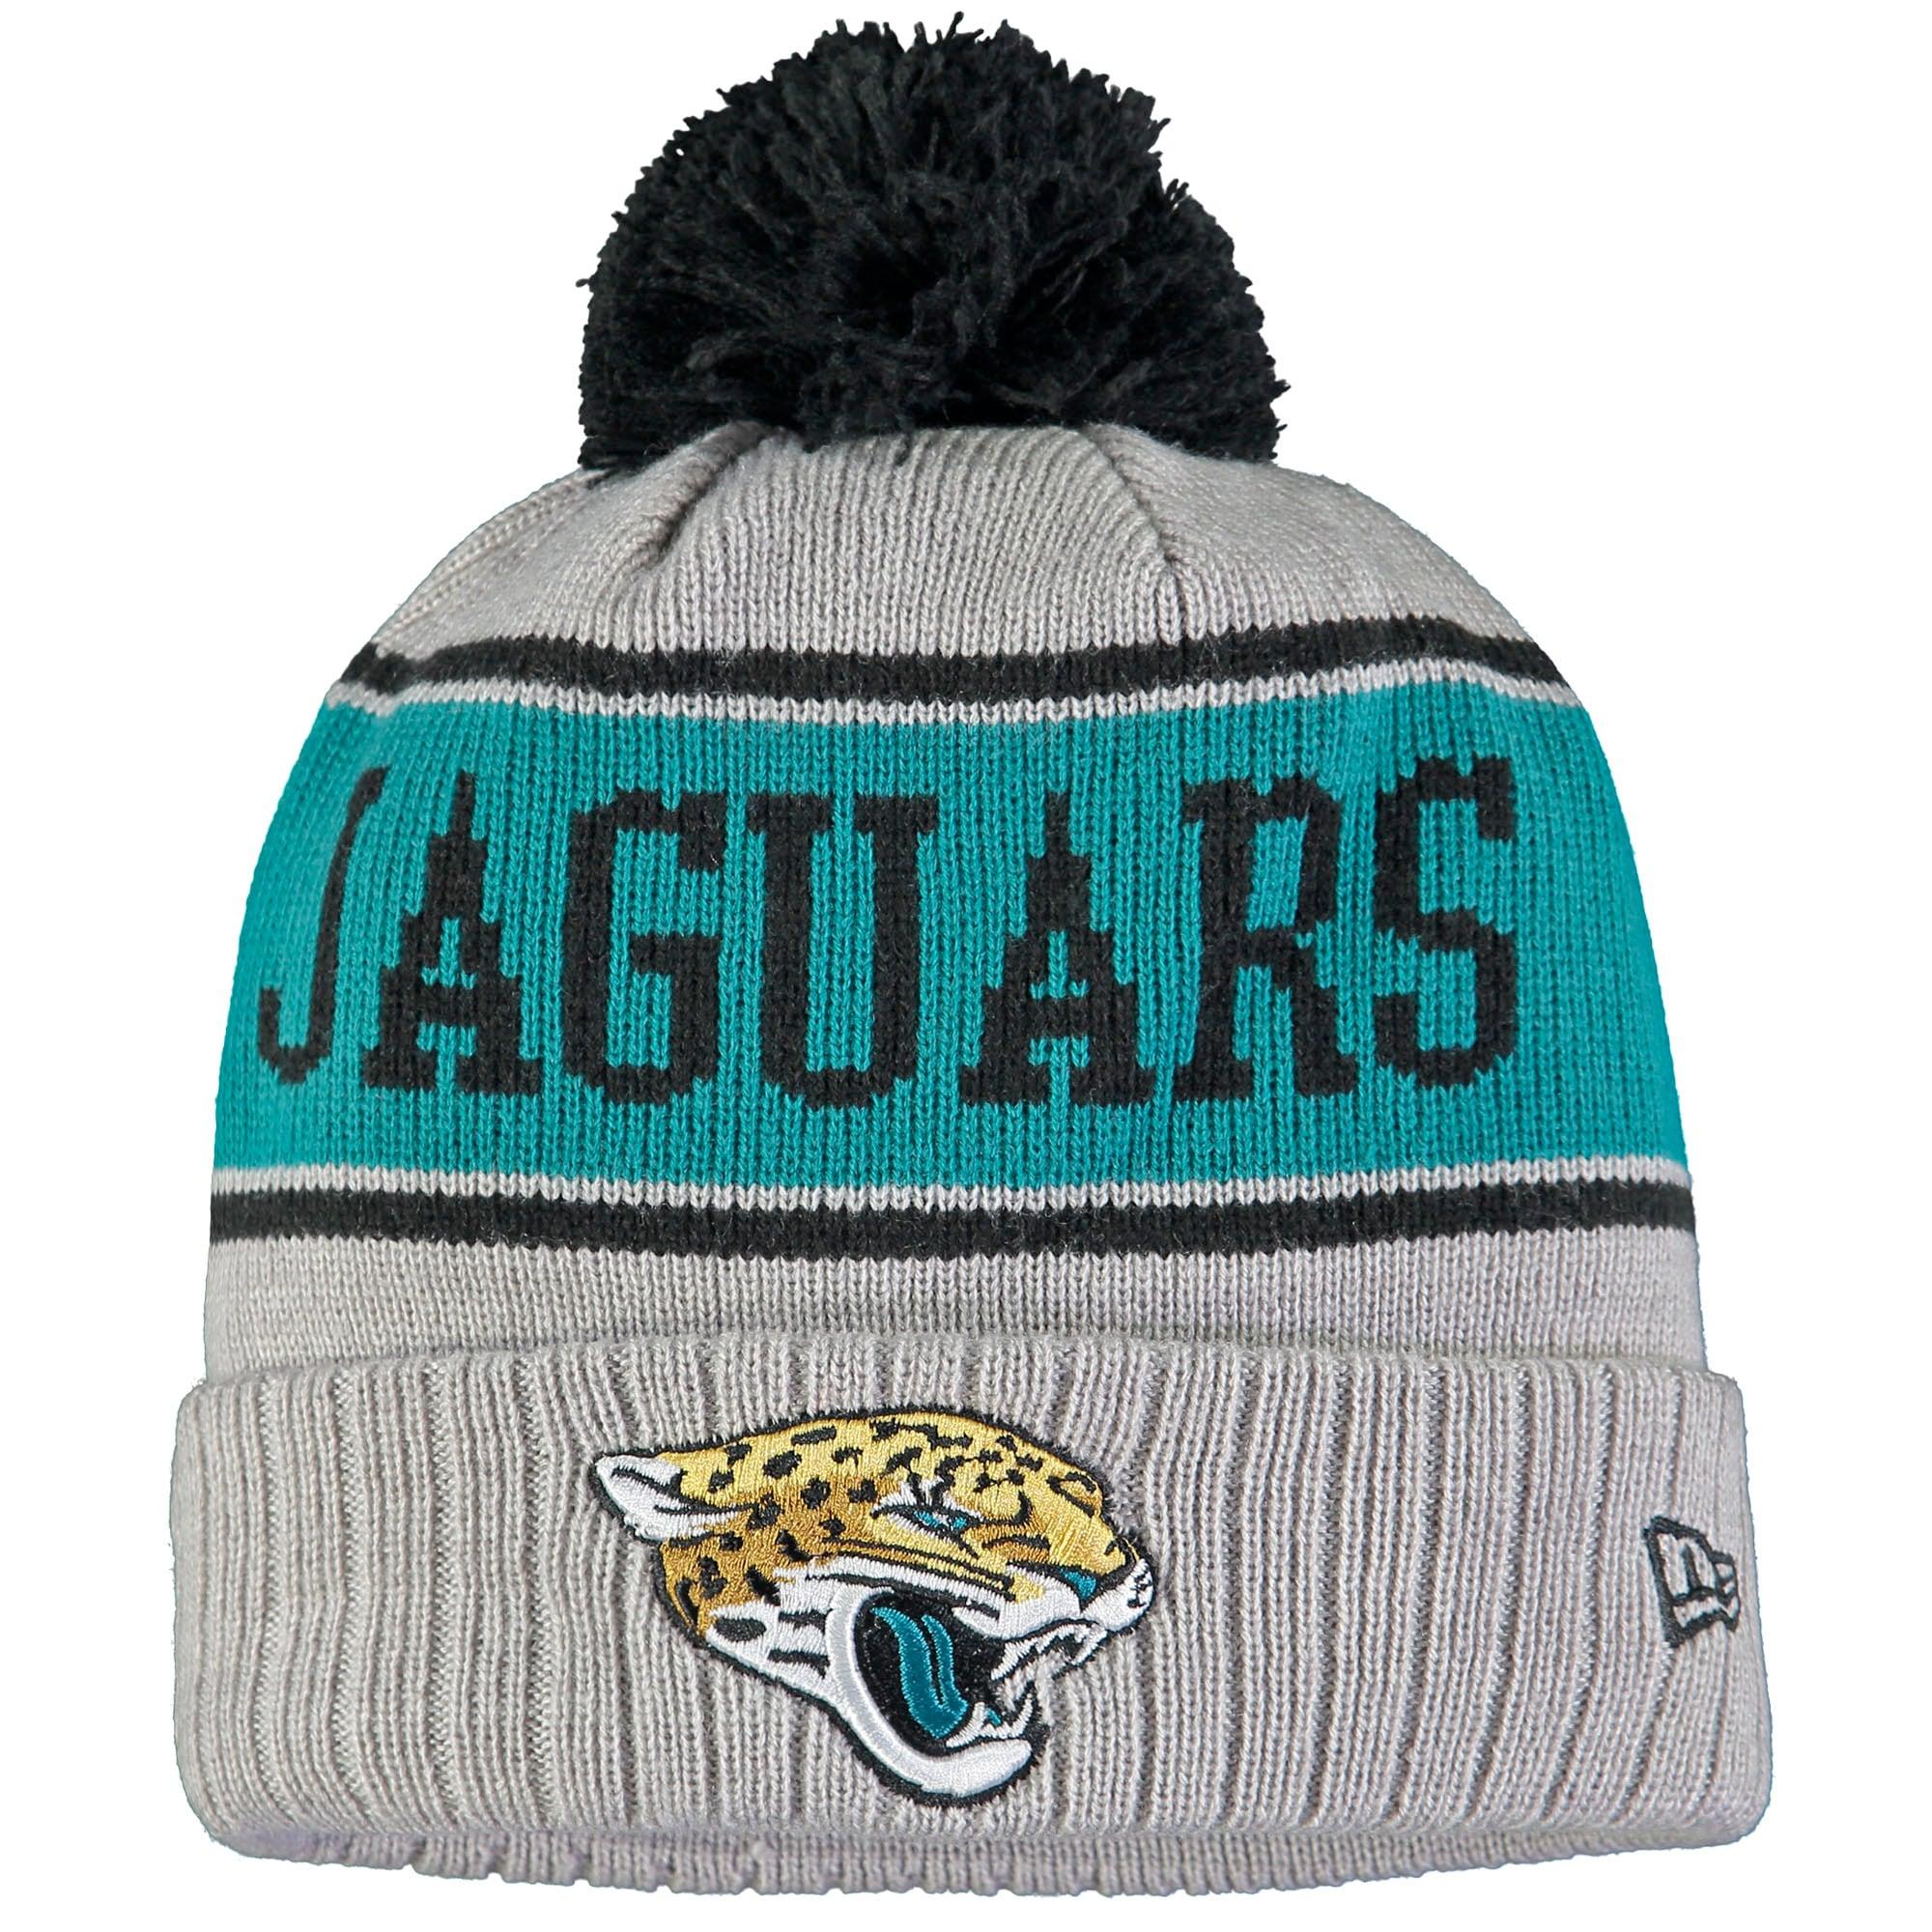 Jacksonville Jaguars New Era Stripe Cuffed Knit Hat with Pom - Gray